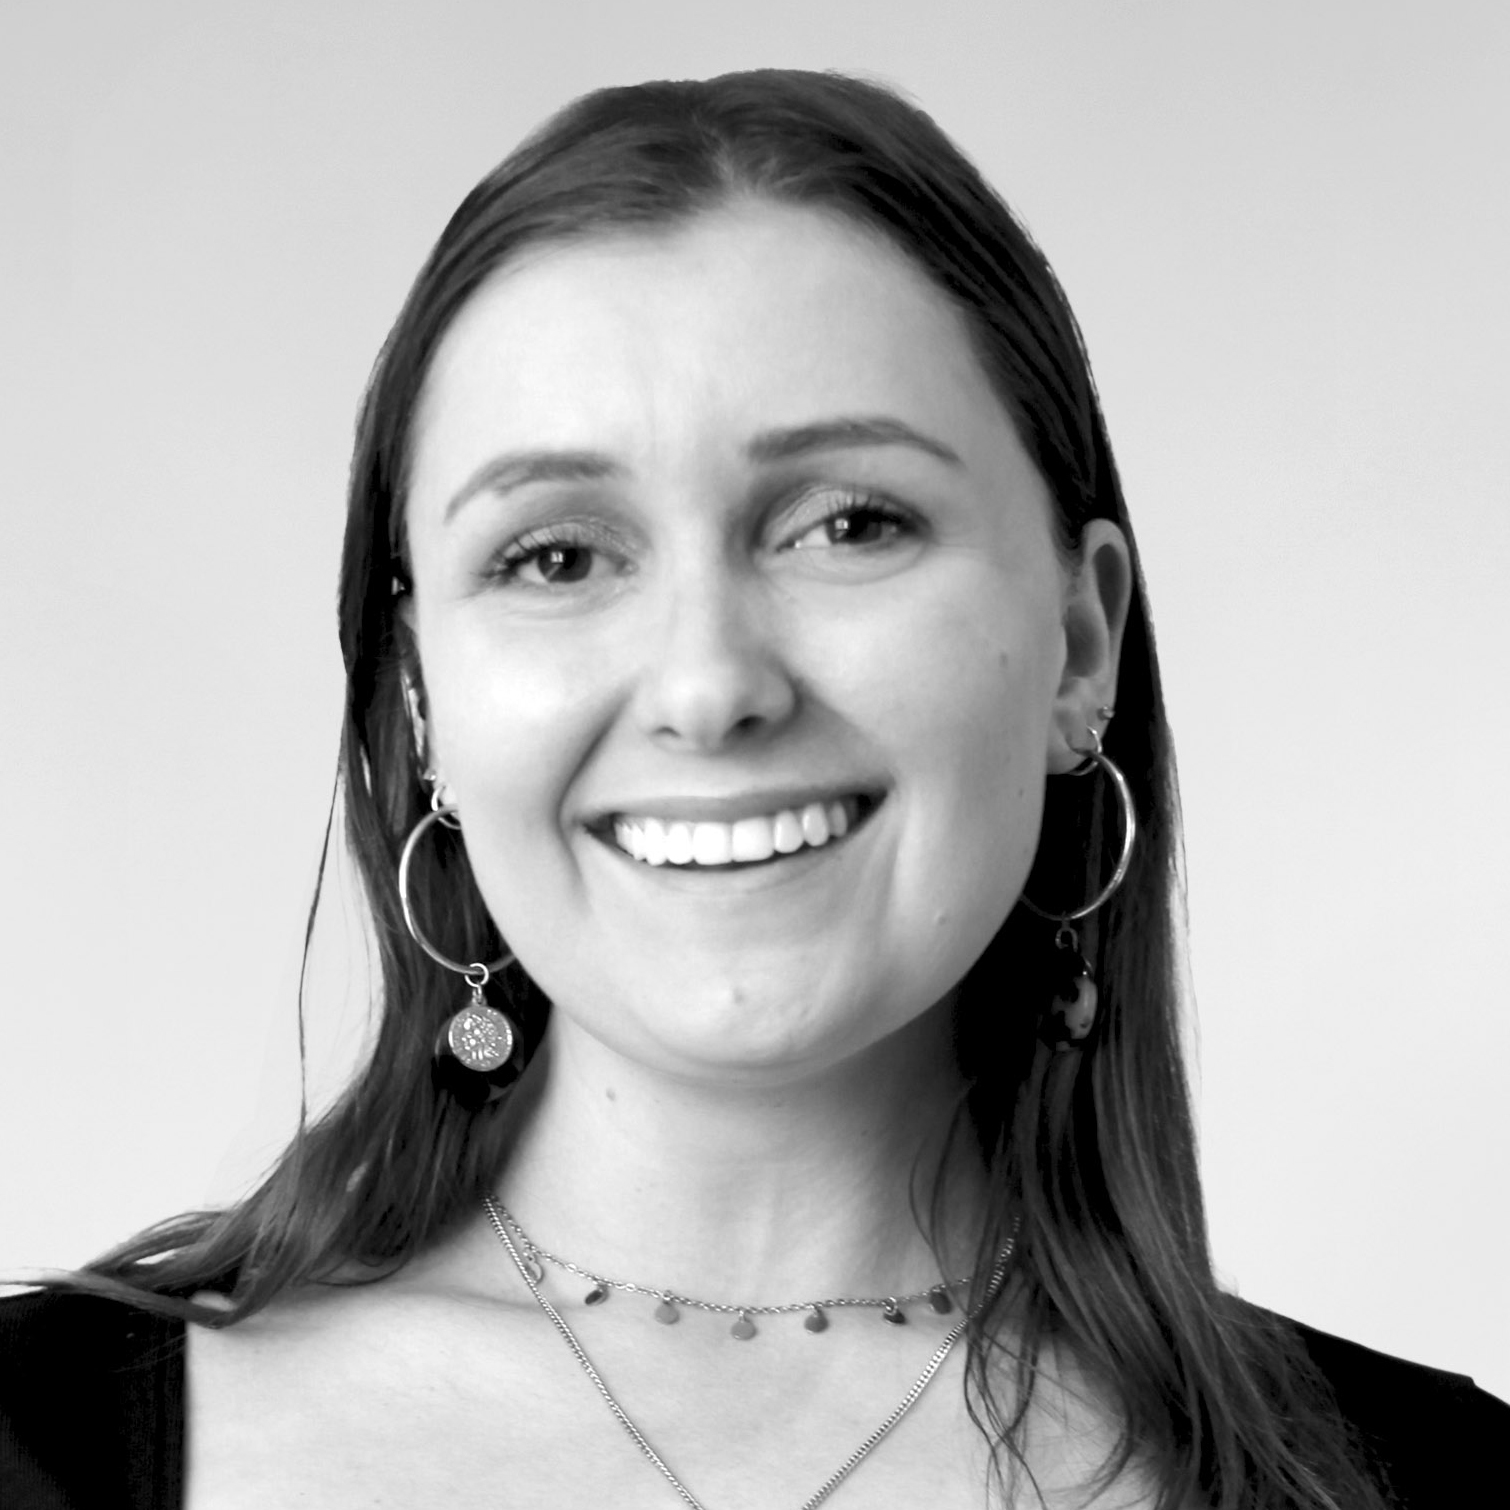 http://staging.ksrarchitects.com/wp-content/uploads/2020/12/Isabelle-Dunlop.jpg